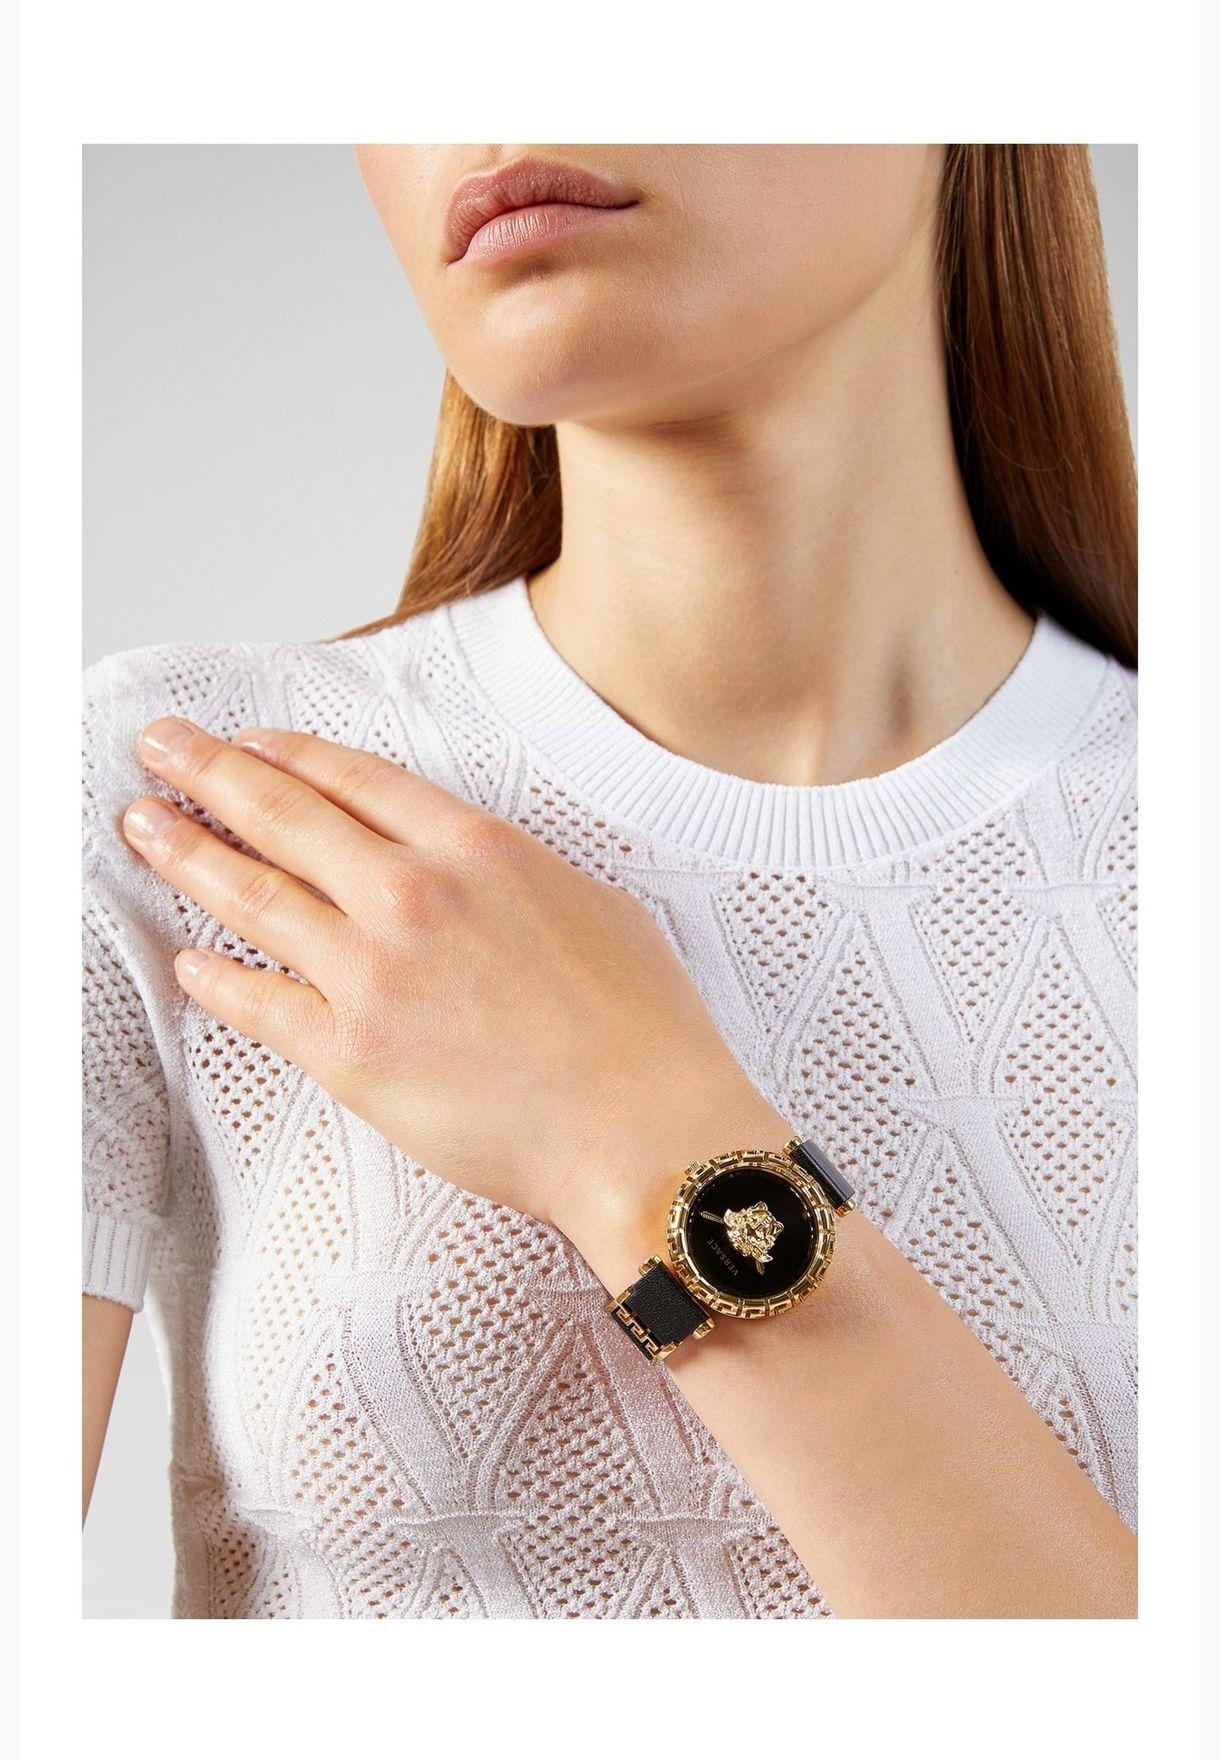 Versace GRECA Leather Strap Watch for Women - VEDV00119